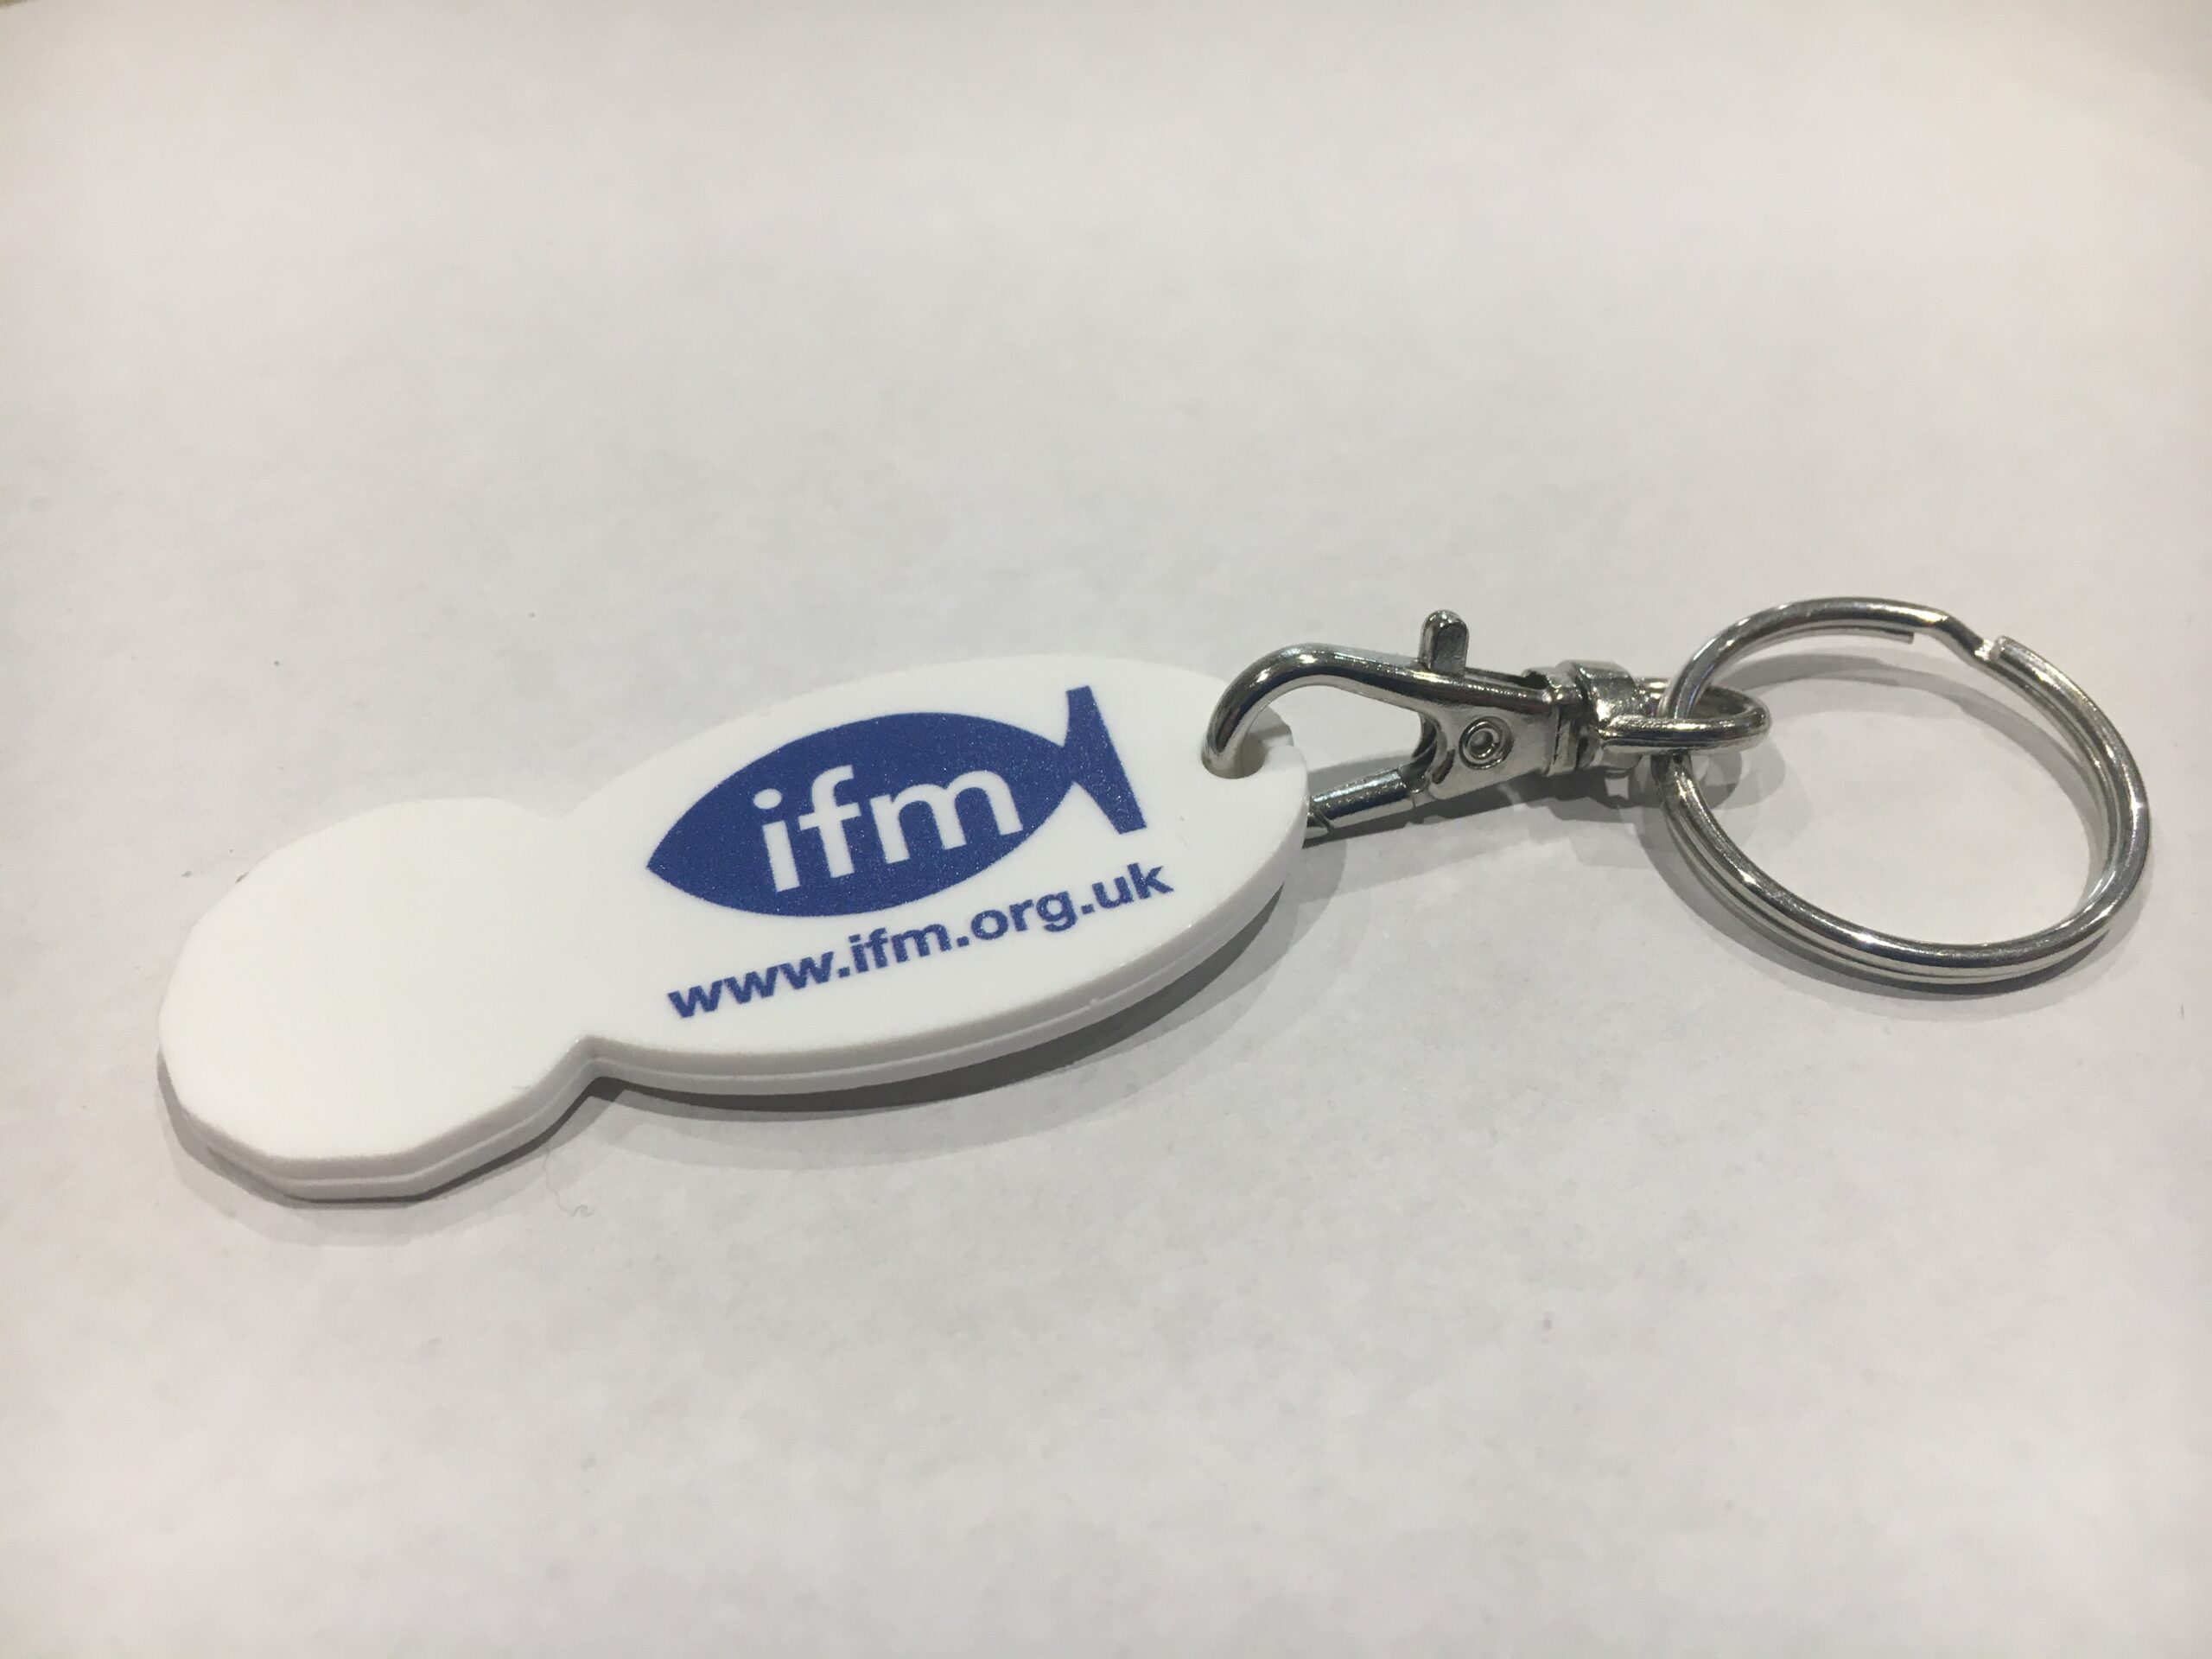 IFM Trolley token keyring